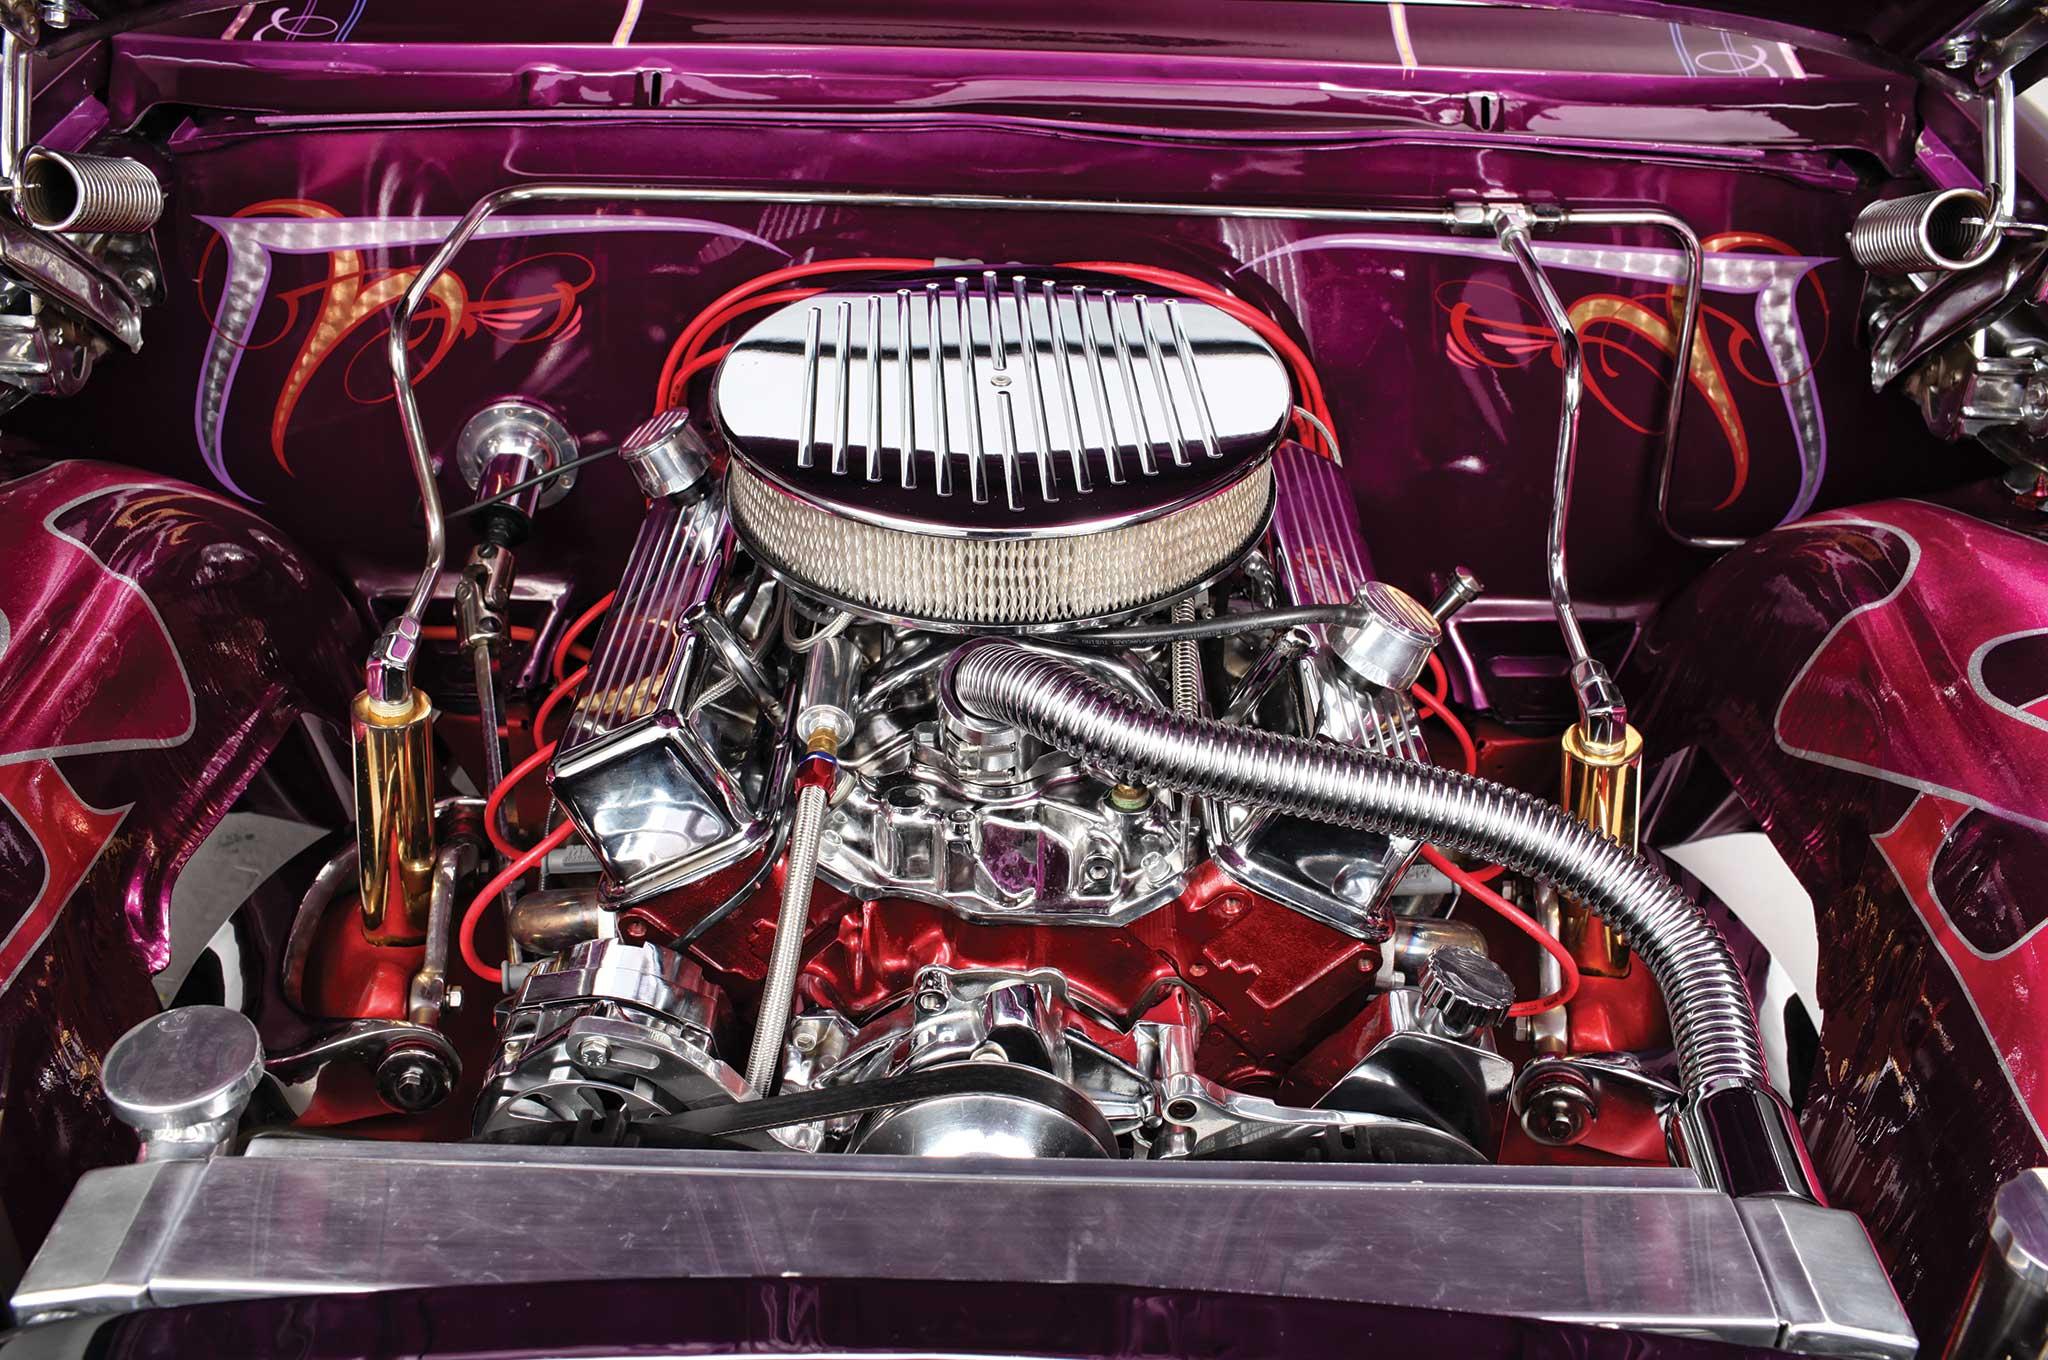 1962 chevrolet impala ss 350 engine 009